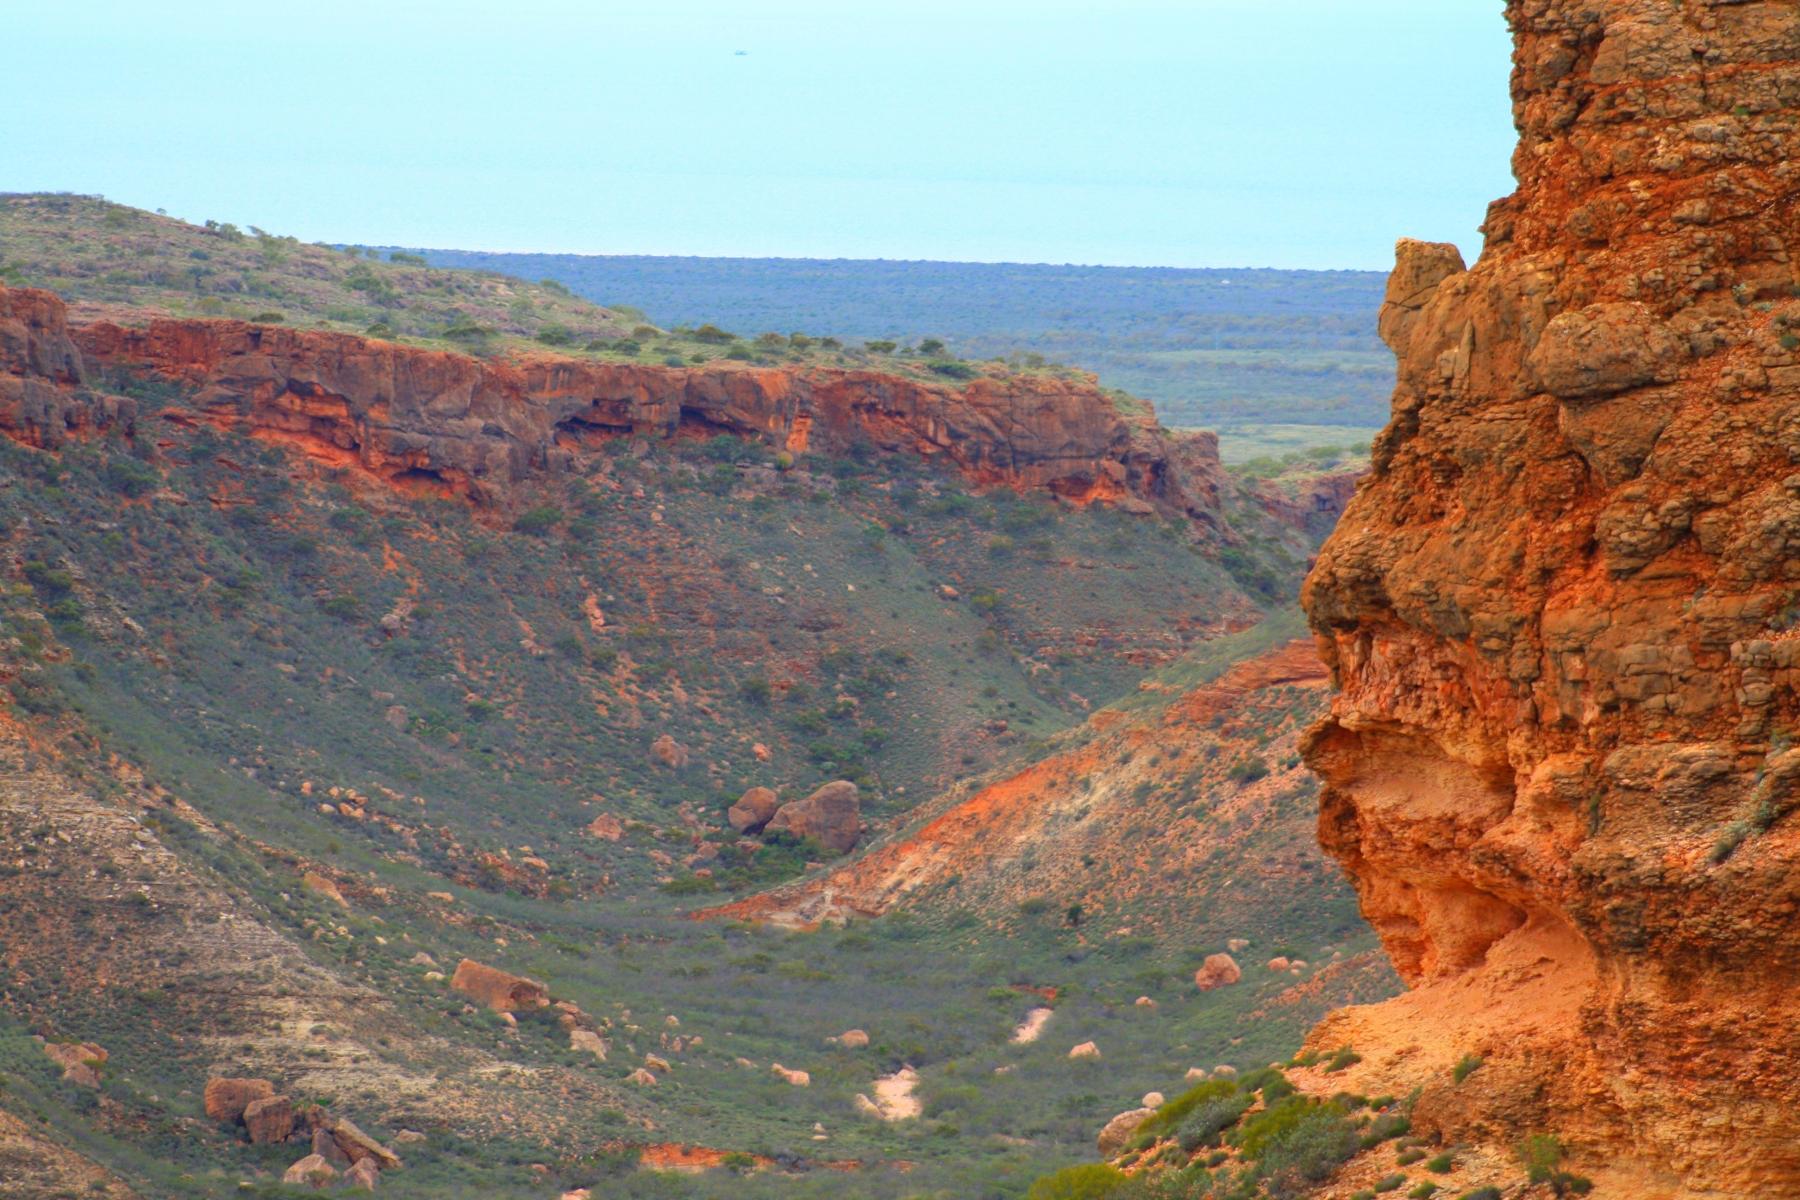 Charles-Knife-Gorger-Cape-Range-National-Park